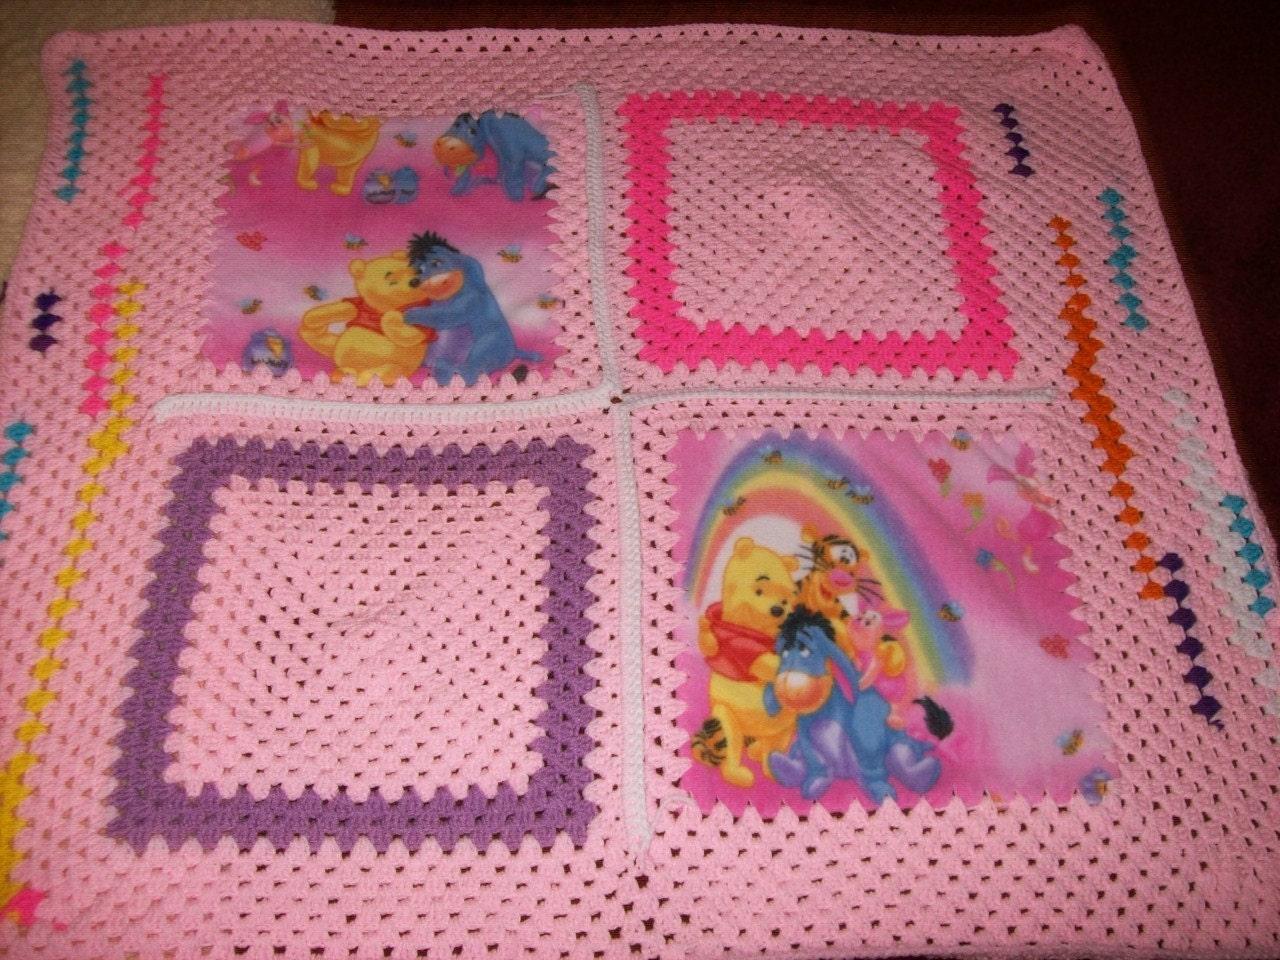 Winnie The Pooh Knitting Patterns Free : FREE WINNIE THE POOH CROCHET PATTERNS   Easy Crochet Patterns